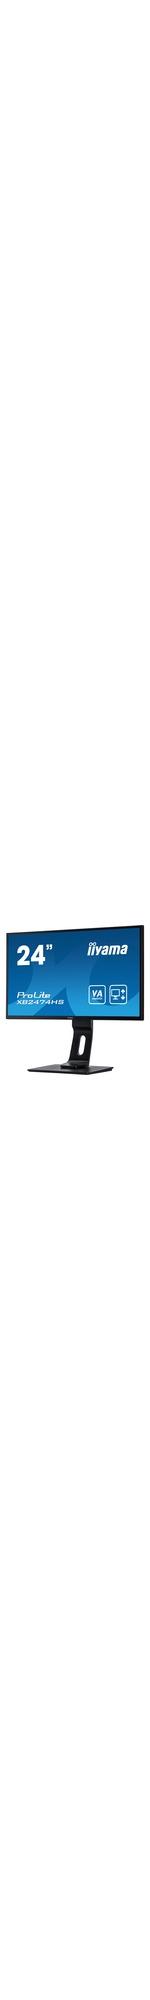 iiyama ProLite XB2474HS-B2  23.6And#34; Full HD LED LCD Monitor - 16:9 - Matte Black